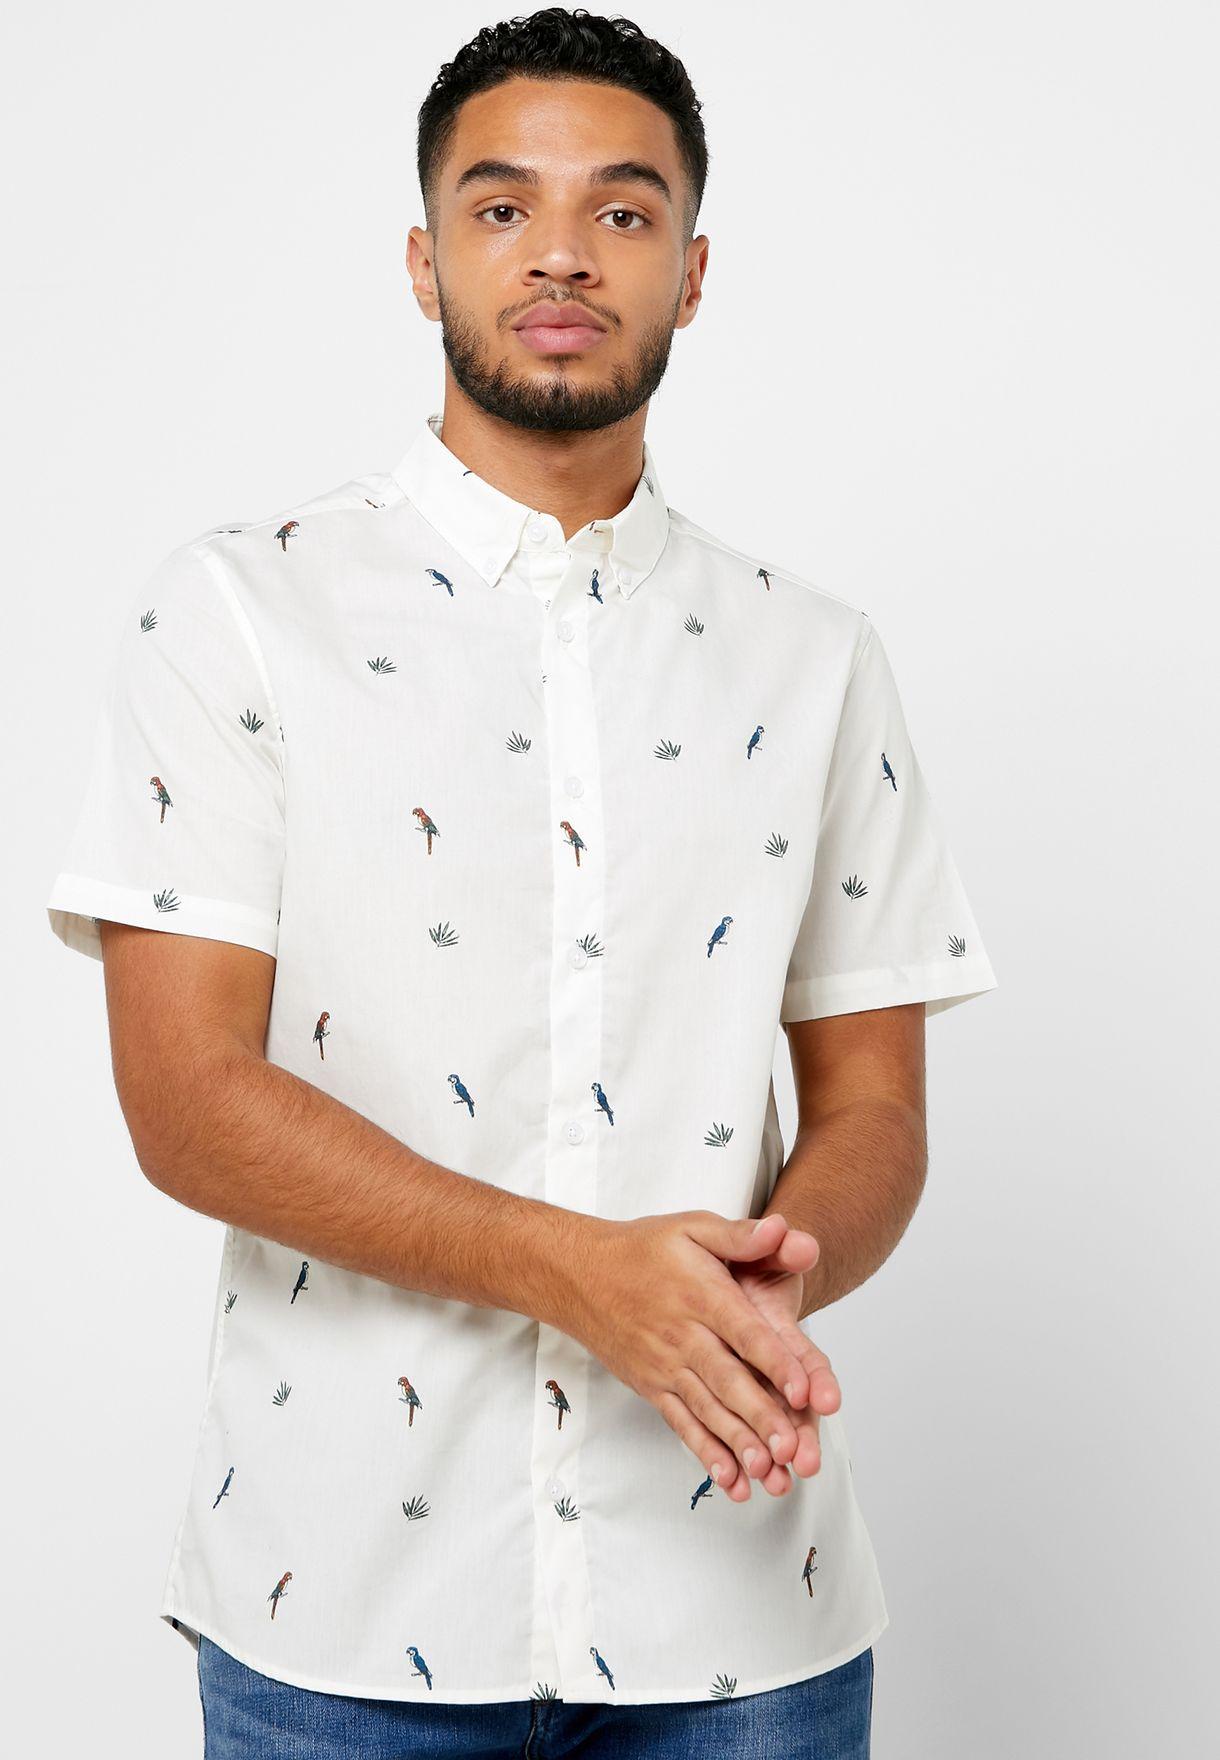 Parrot Print Shirt